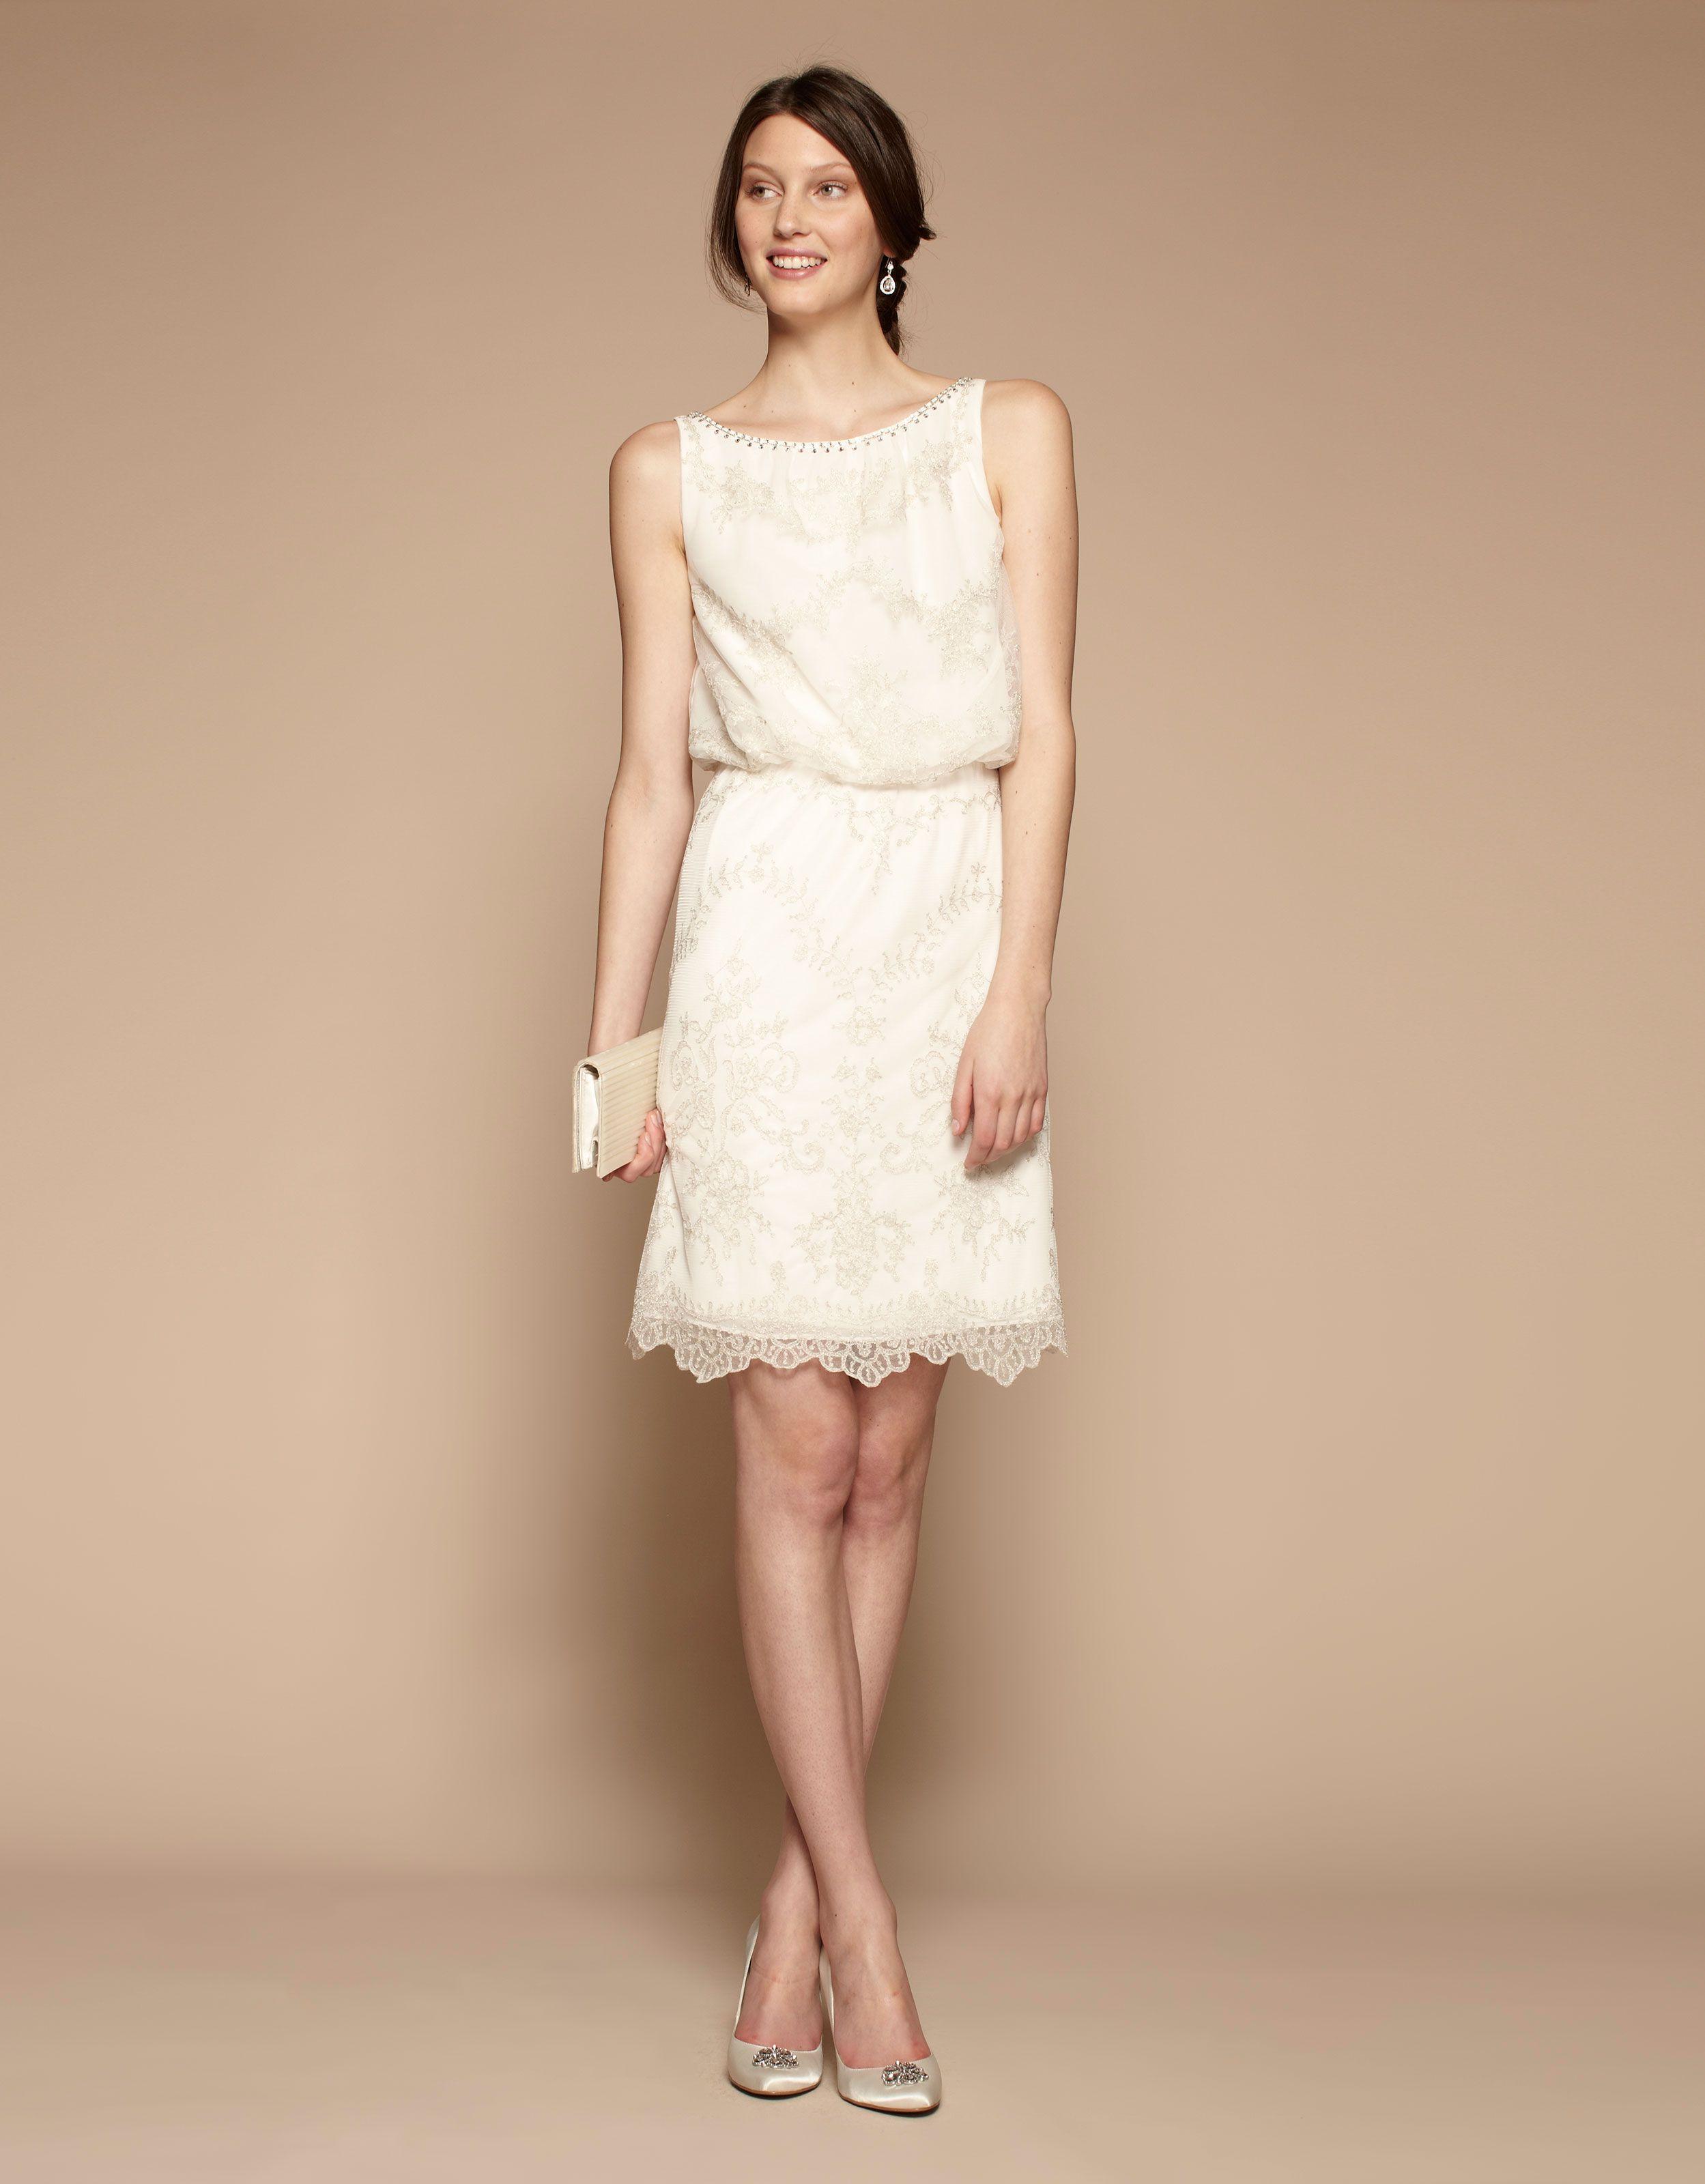 Etienne Dress Short Wedding Dress Simple Bridal Gowns Casual Wedding Dress [ 3200 x 2498 Pixel ]